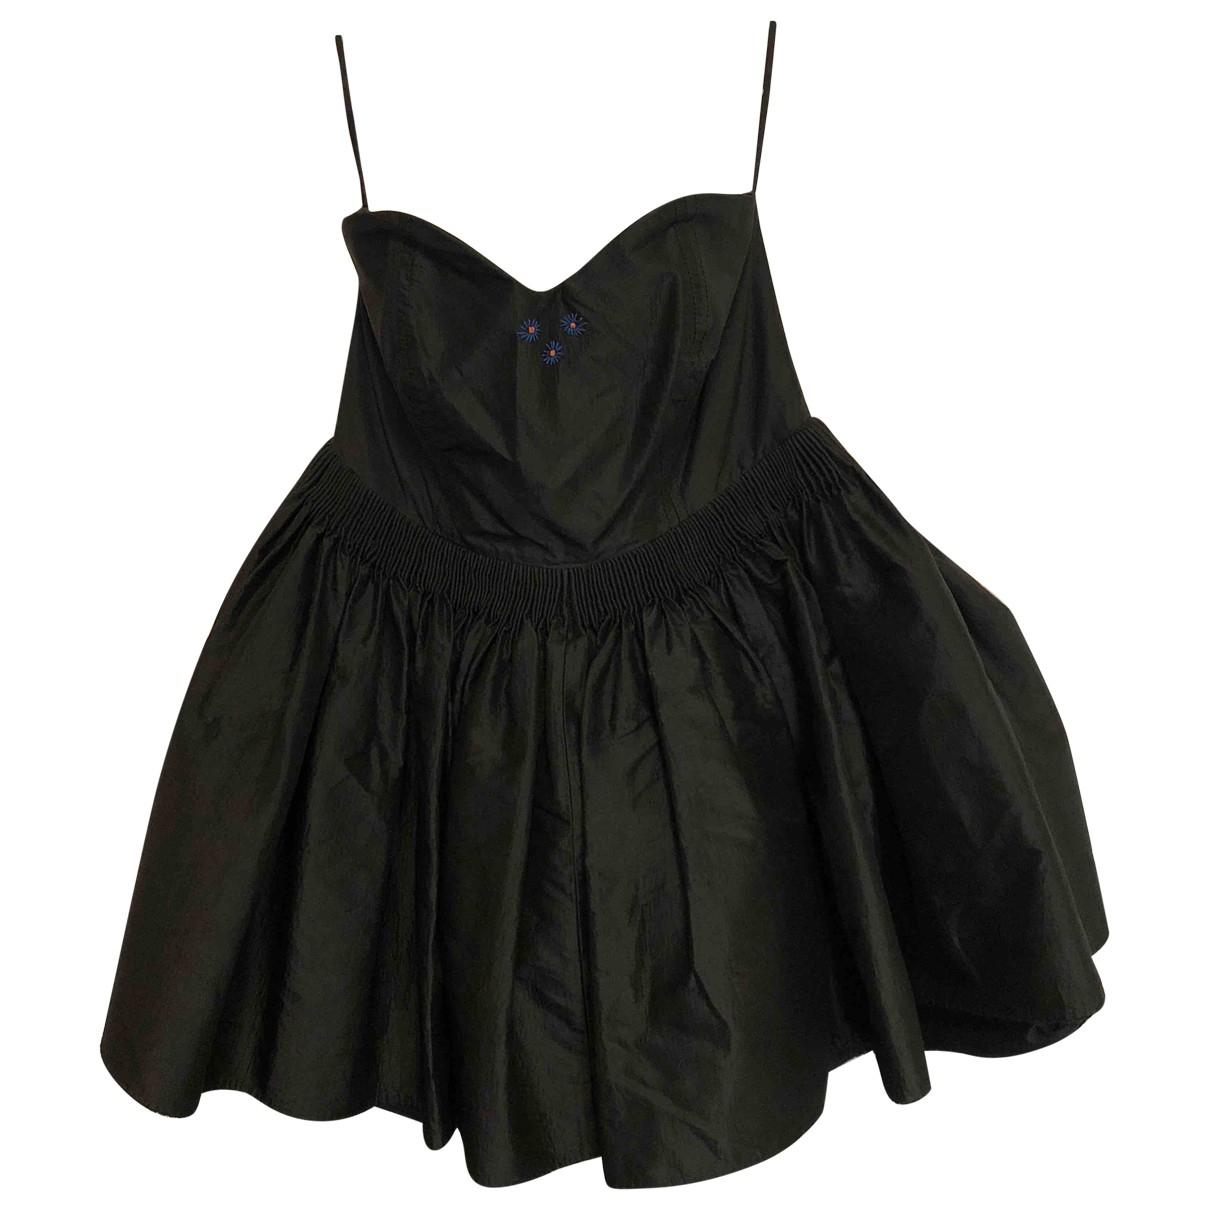 Luella \N Kleid in  Schwarz Synthetik